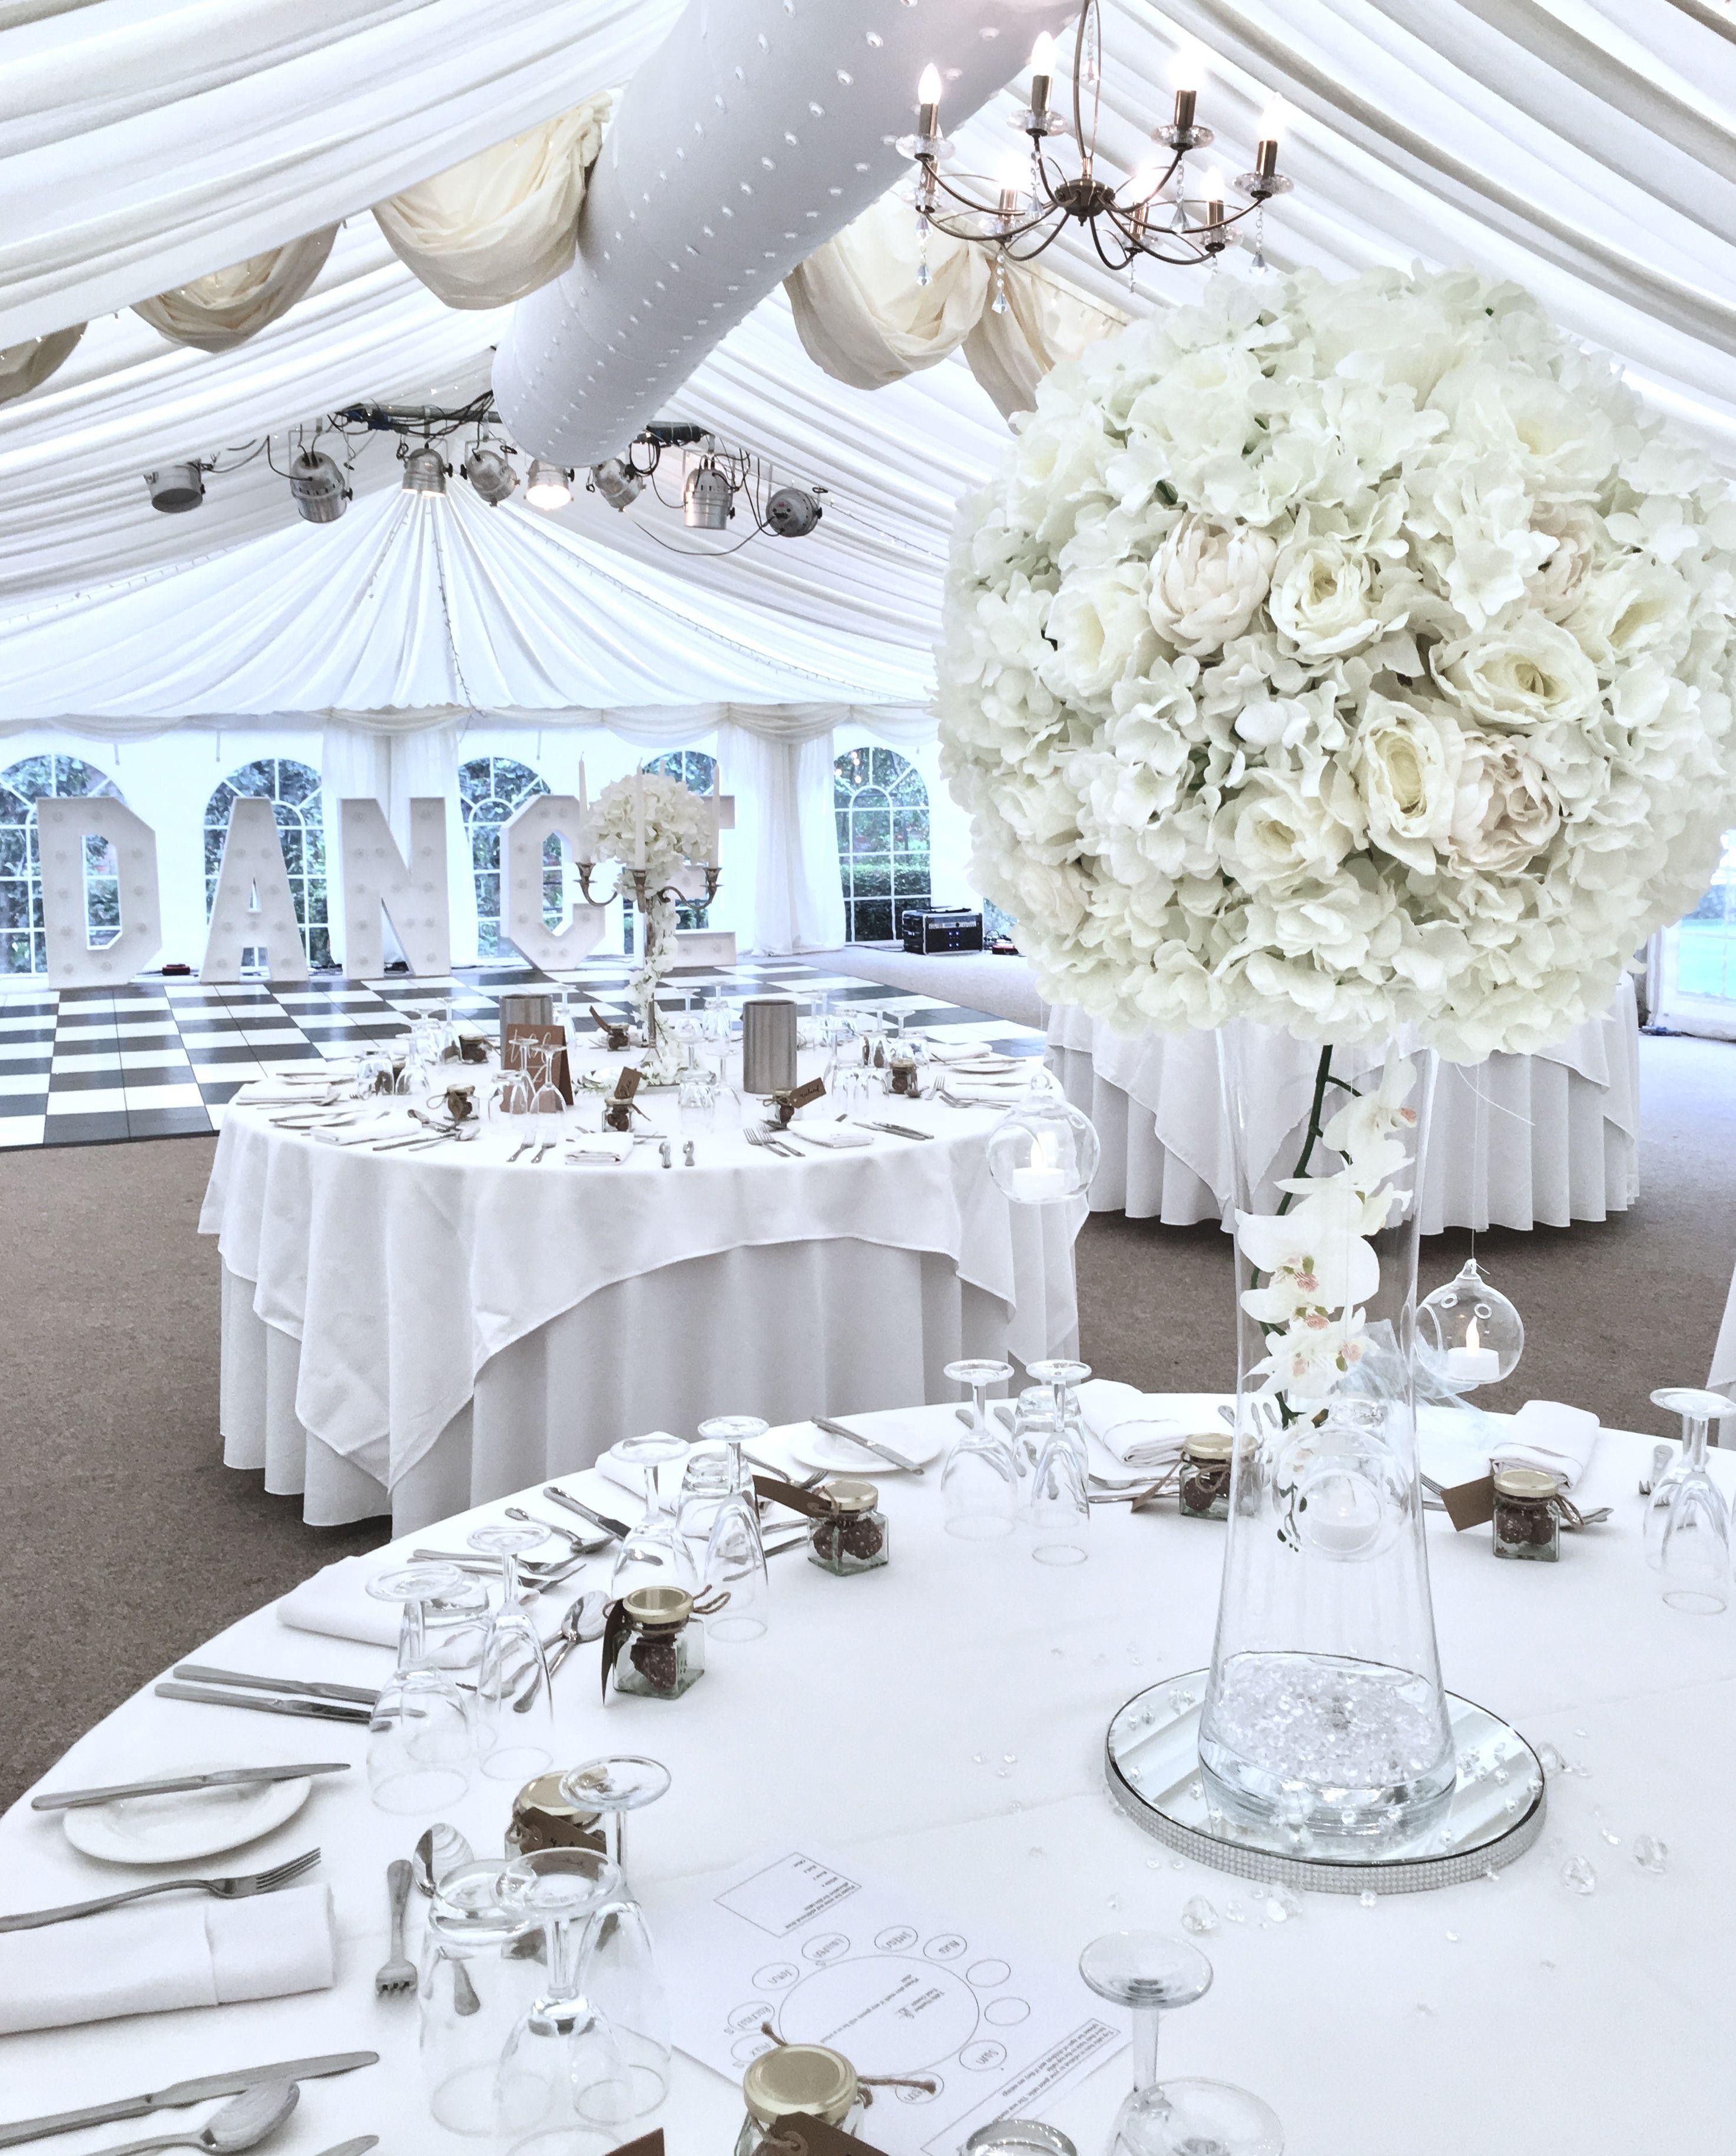 Wedding Decoration Hire In Nottingham Haus Dekoration Shop Holz Haus Dekoration In 2020 Wedding Reception Table Decorations Table Decorations Table Lanterns Wedding